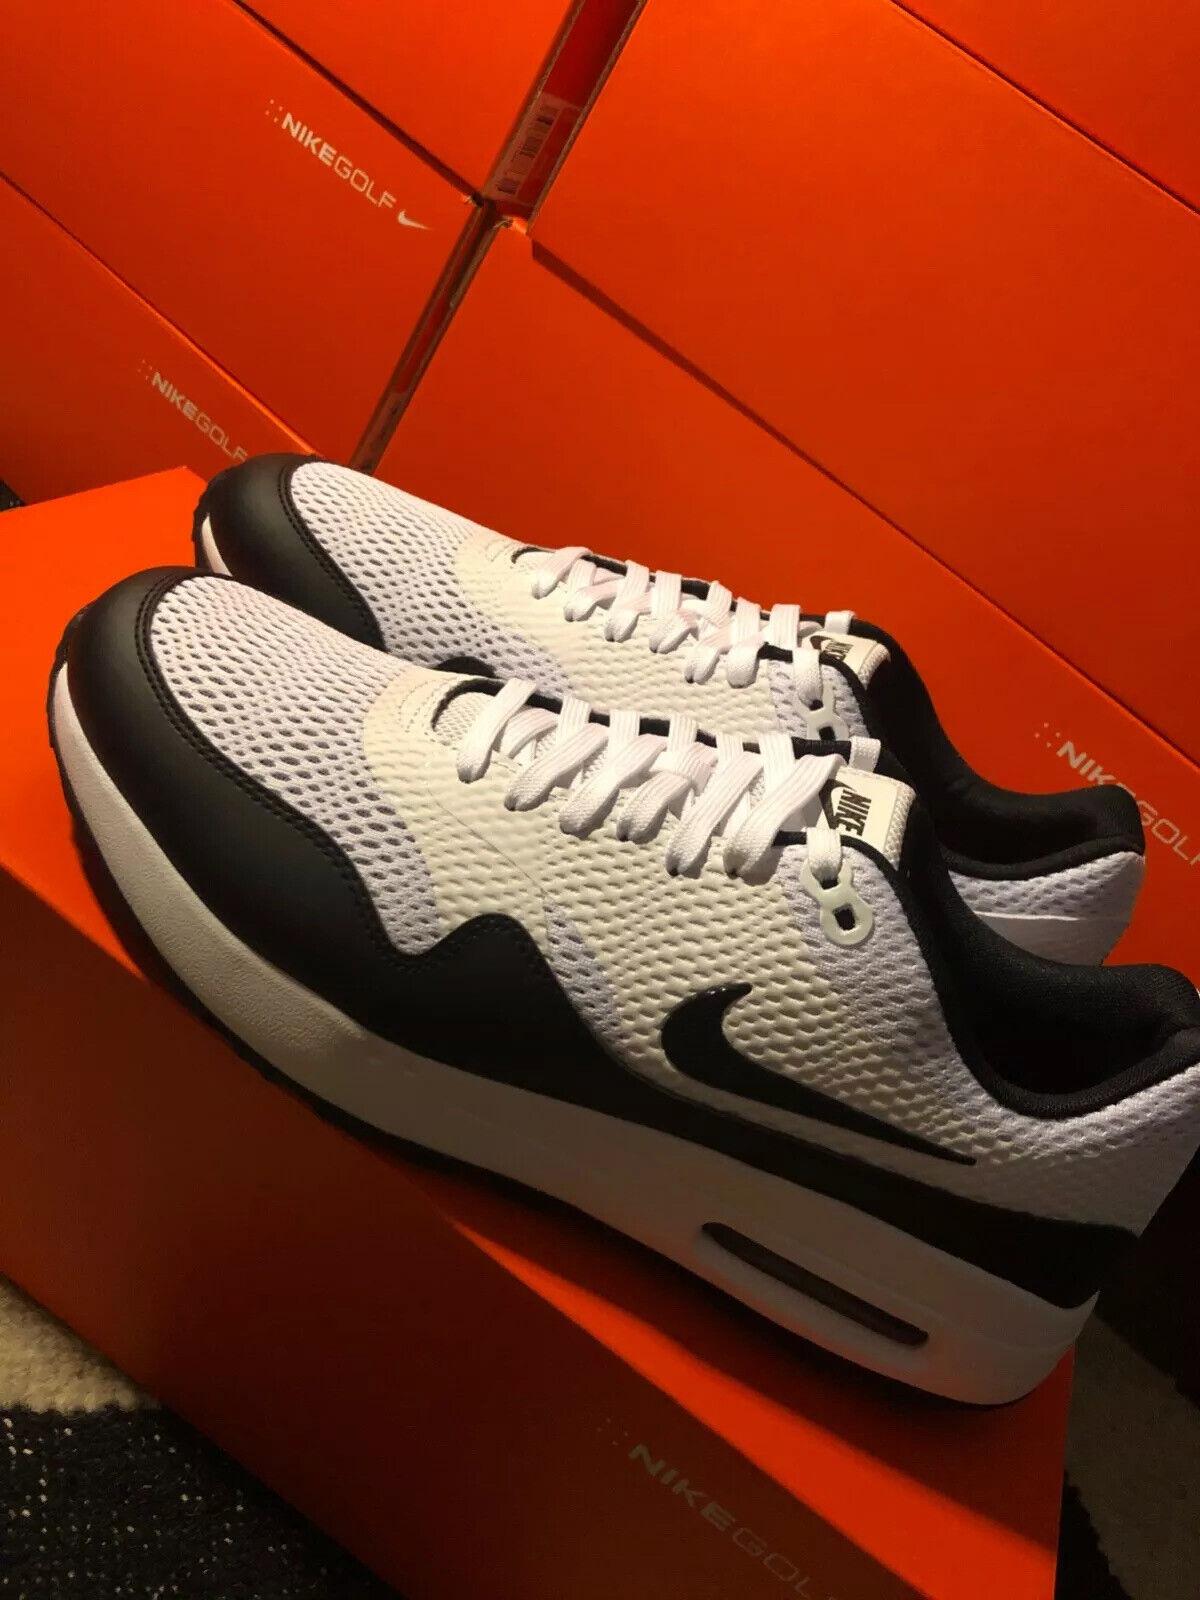 Nike F1 Flex Size 11 Black White Grey 849960 001 Mens Golf Shoes For Sale Online Ebay